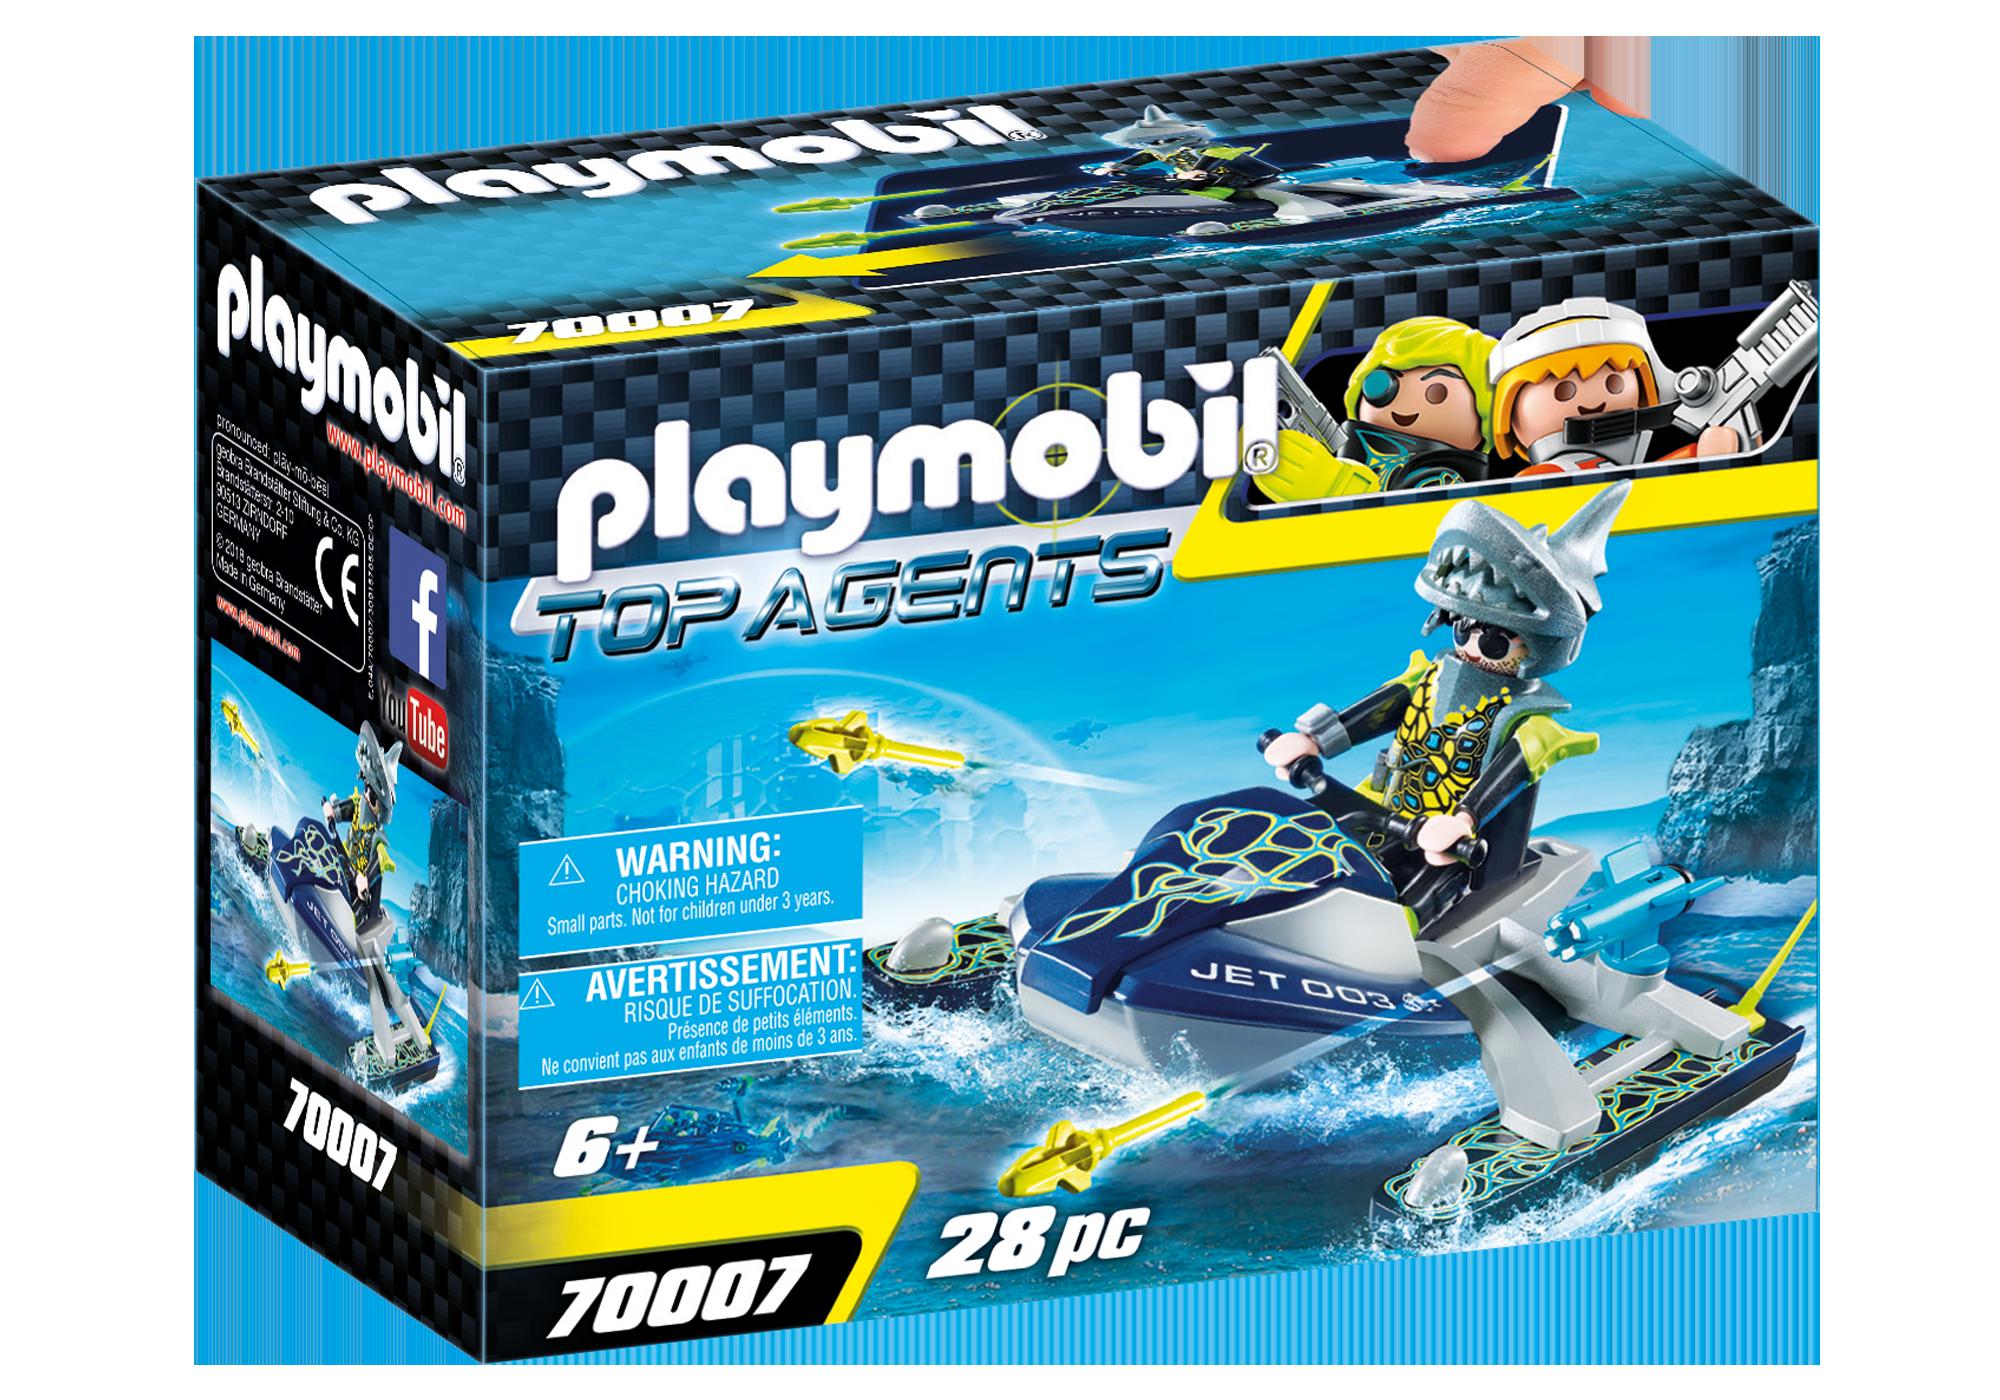 http://media.playmobil.com/i/playmobil/70007_product_box_front/TEAM S.H.A.R.K. Vandscooter med raketter